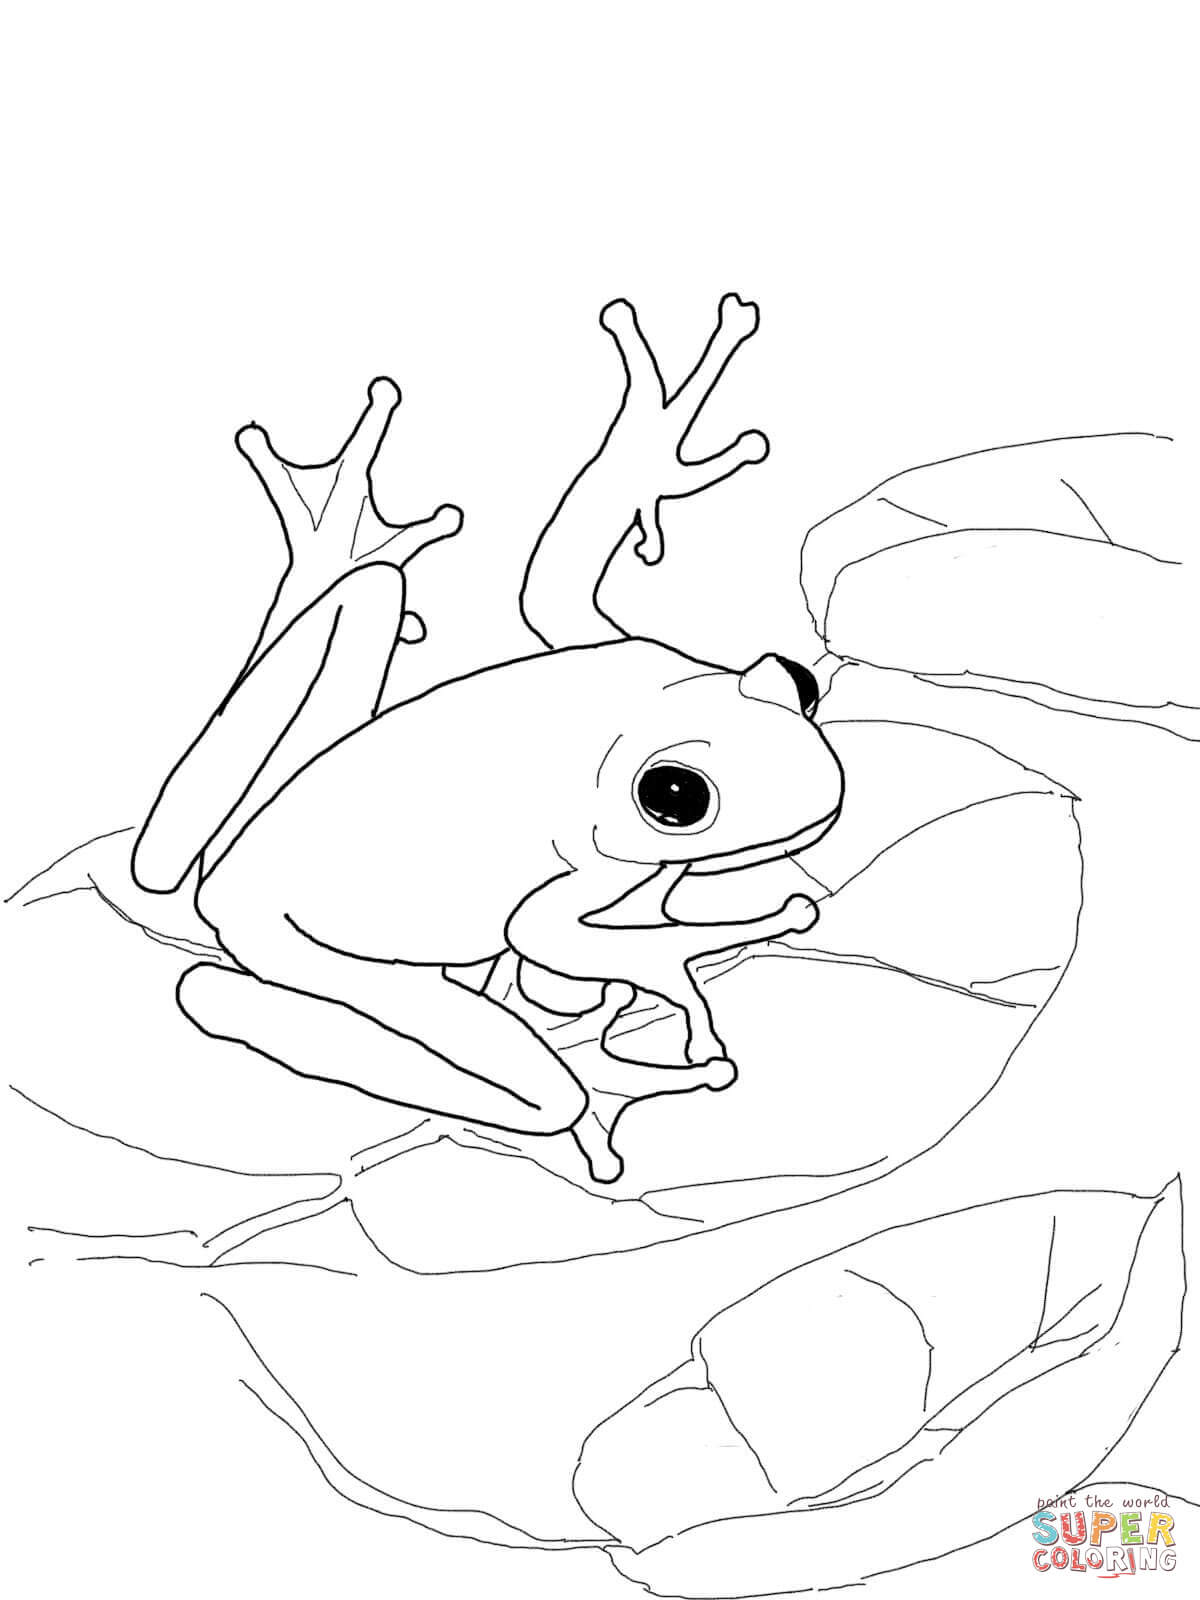 Green Frog coloring #1, Download drawings